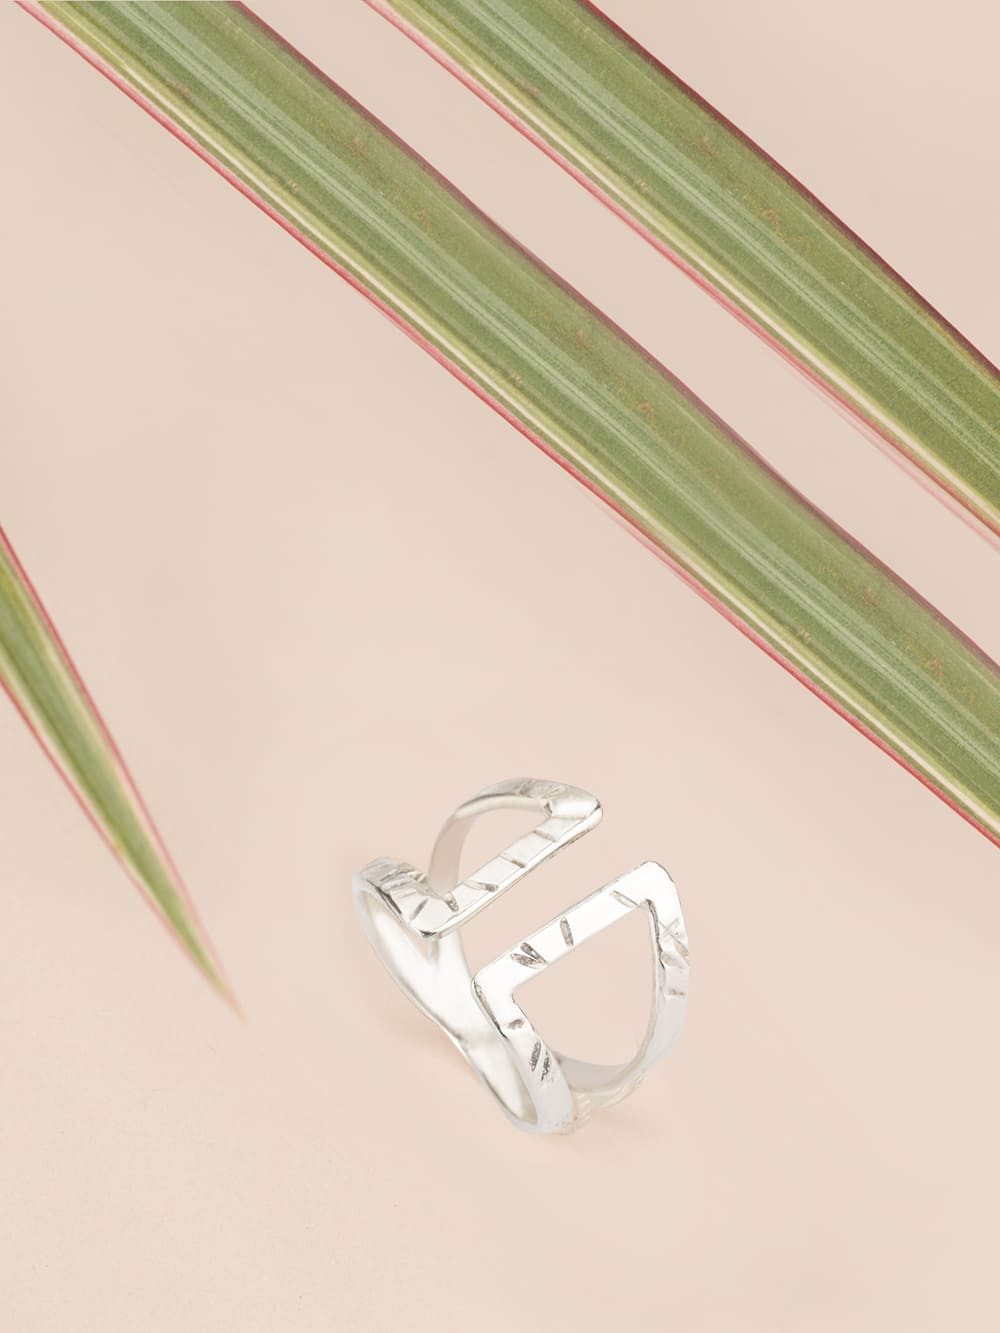 anillo de plata para chica, joyas para regalar a mi mejor amiga, comprar anillos de plata baratos para regalo, joyas marteliè barcelona, joyasmarket